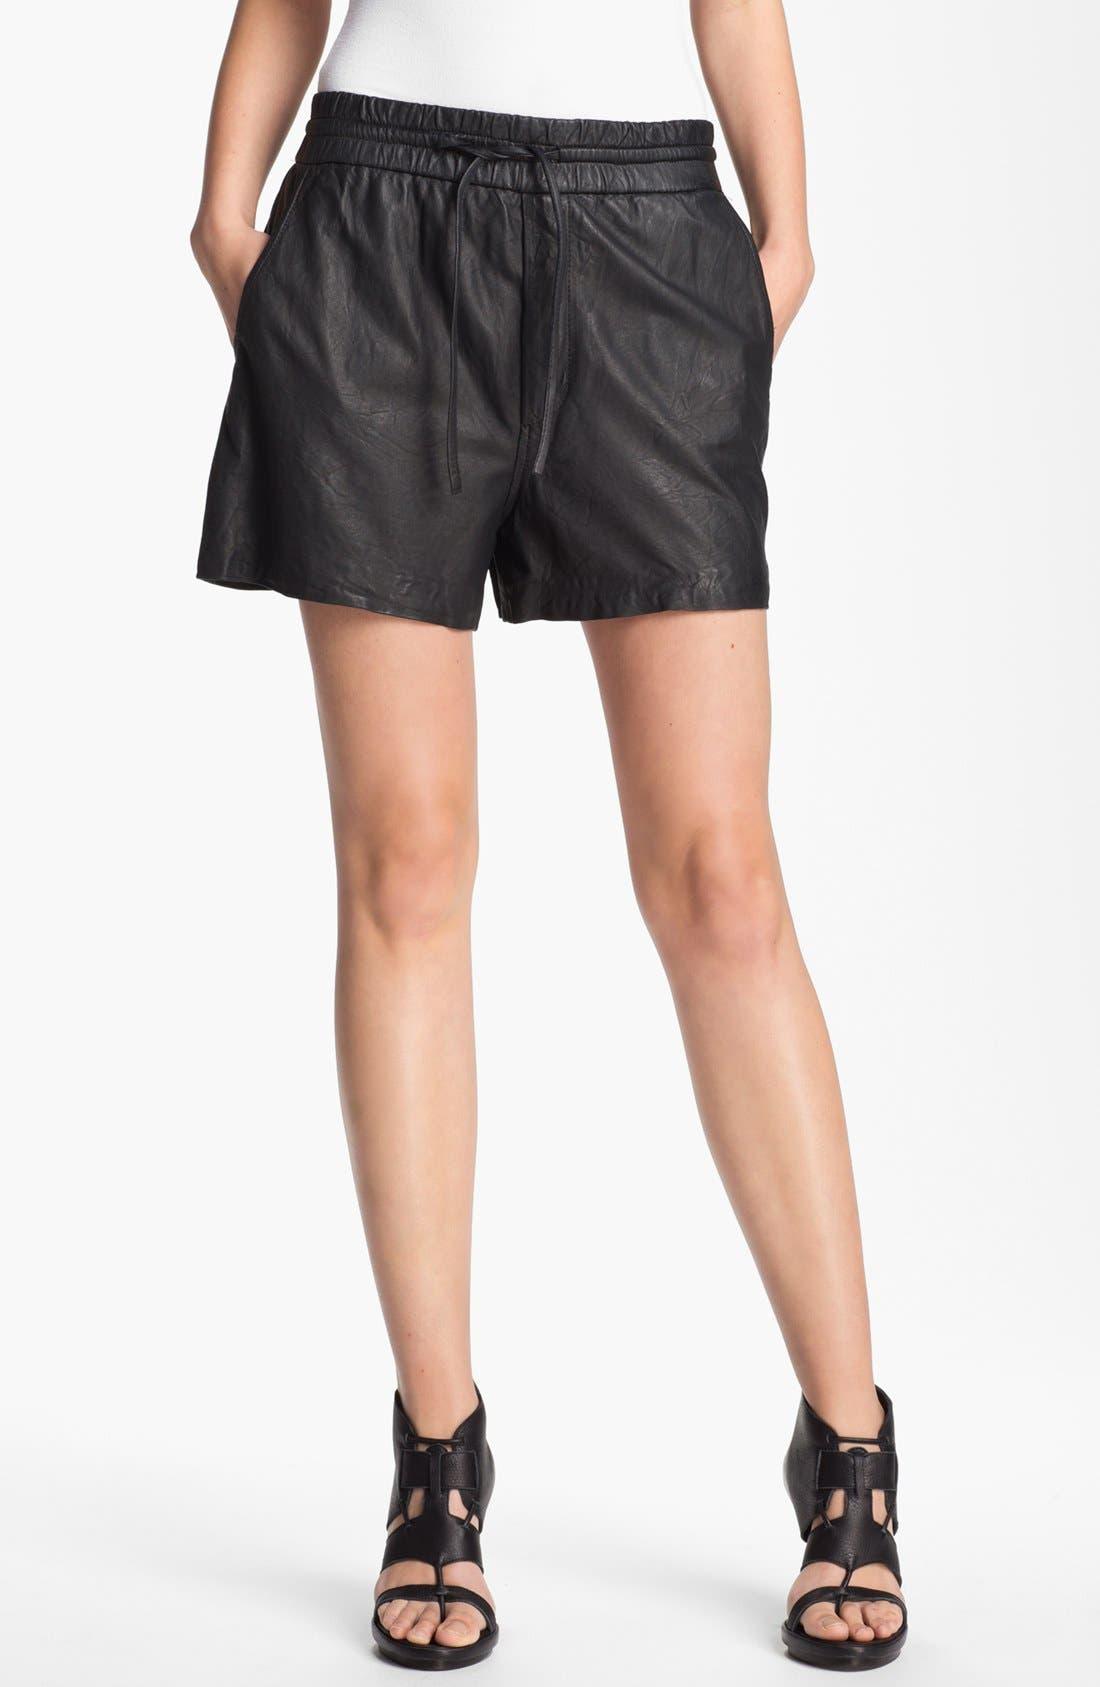 Alternate Image 1 Selected - HELMUT Helmut Lang Washed Leather Shorts